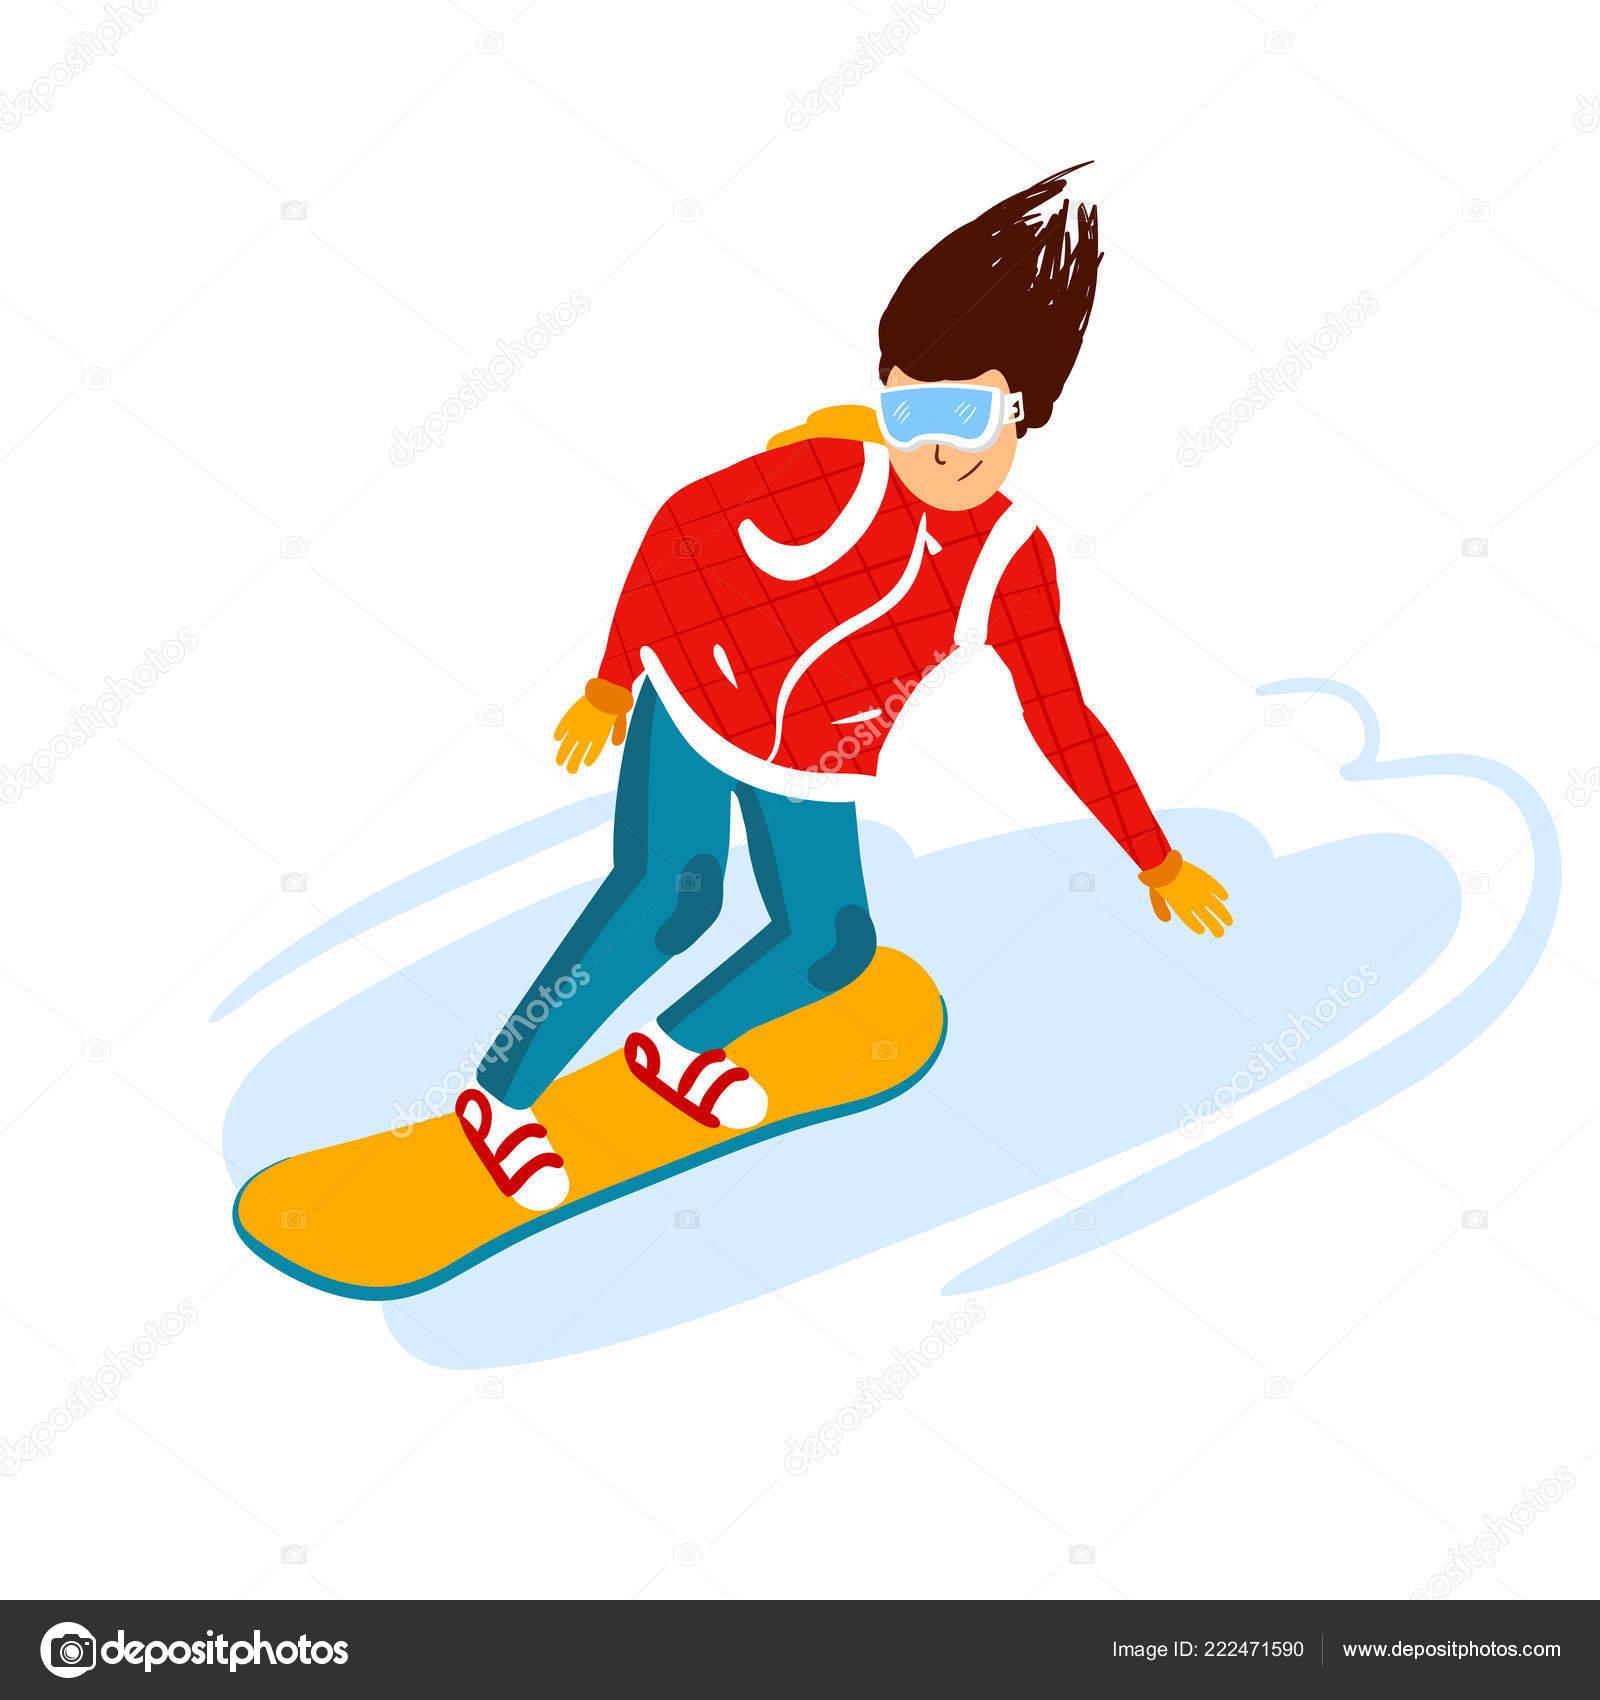 Cartoon Snowboard Riders Men Winter Mountain Sports Activity Ski Resort Vacation Vector Illustration In Simple Flat Style Stock Vector C Loresina 222471590